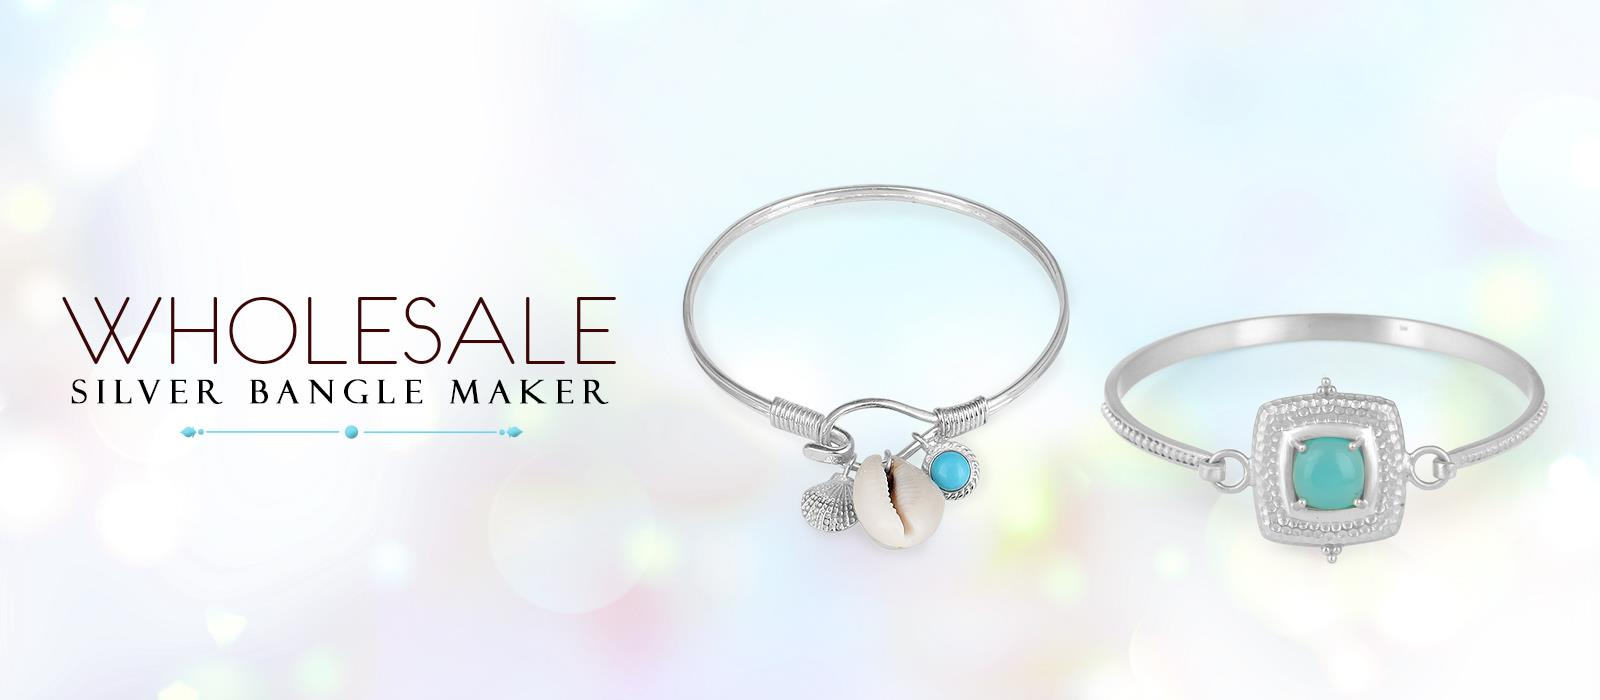 Wholesale Silver Bangles Maker